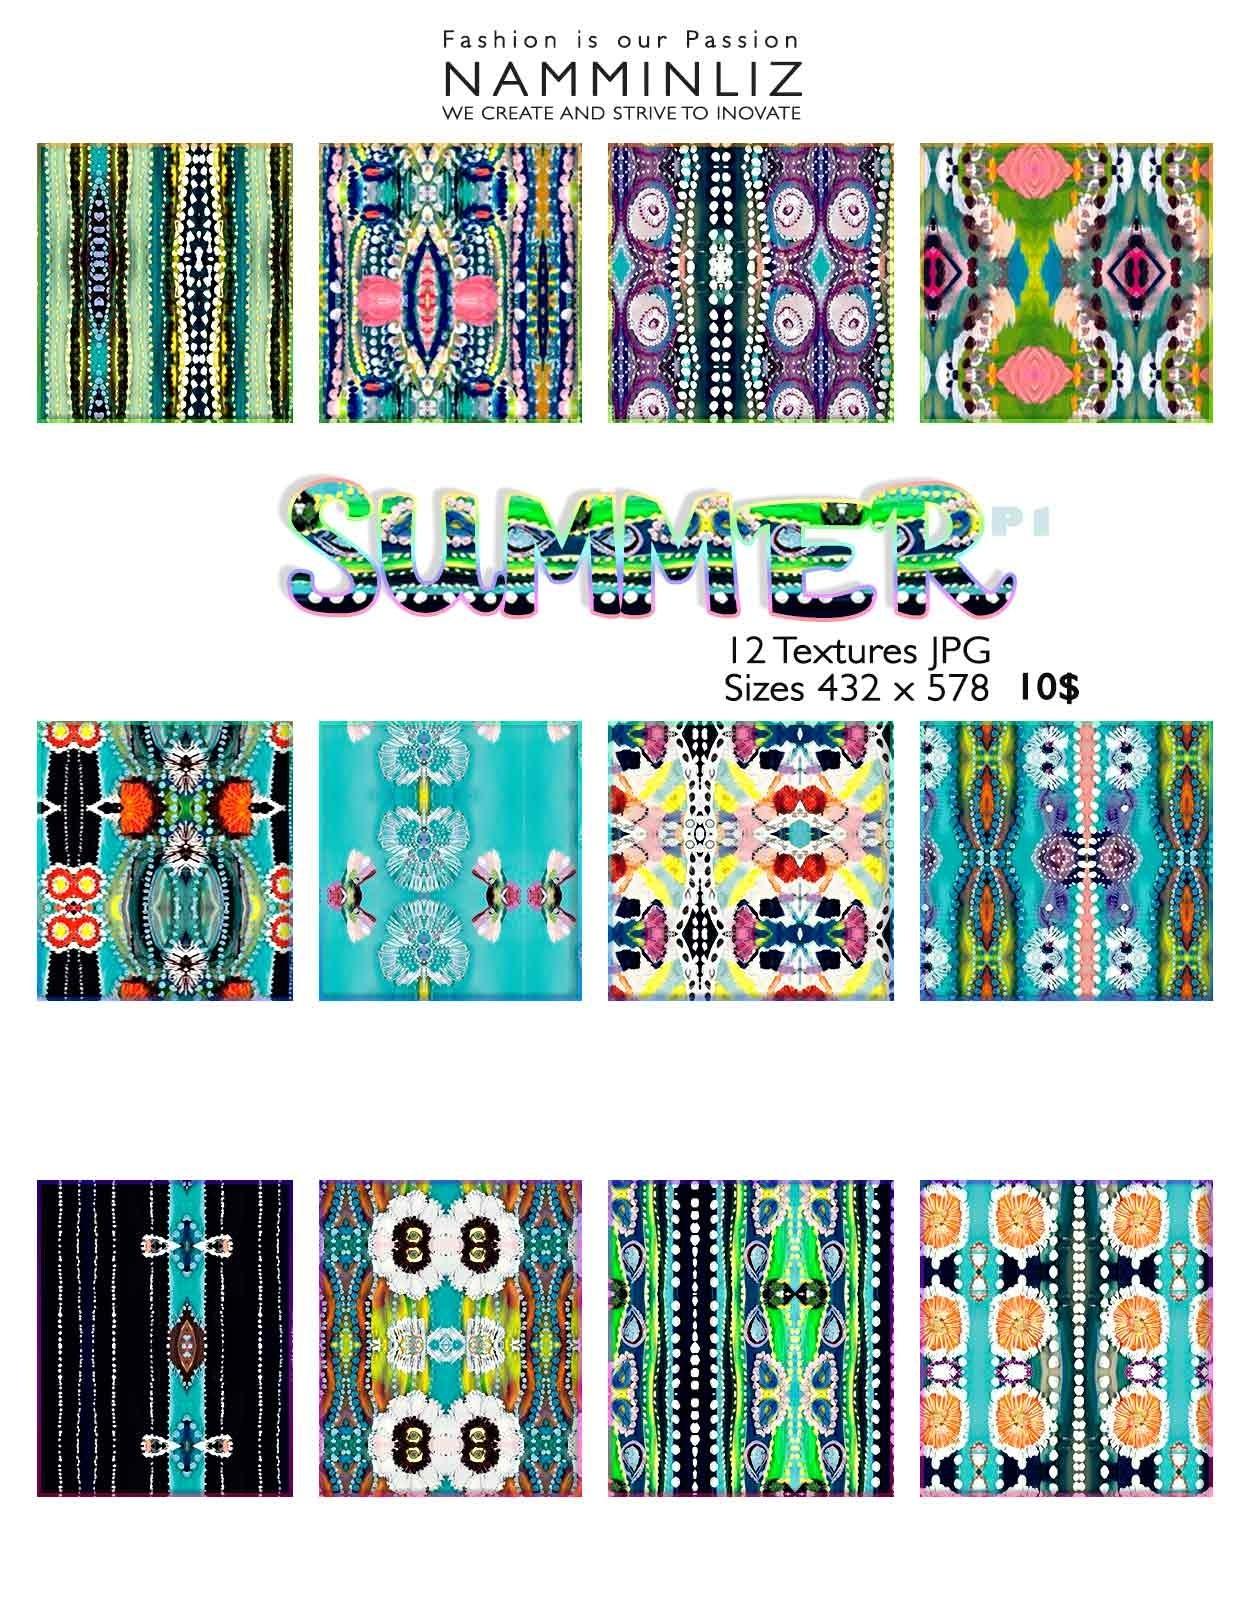 Summer Textures P1  • 12 Textures JPG imvu NAMMINLIZ